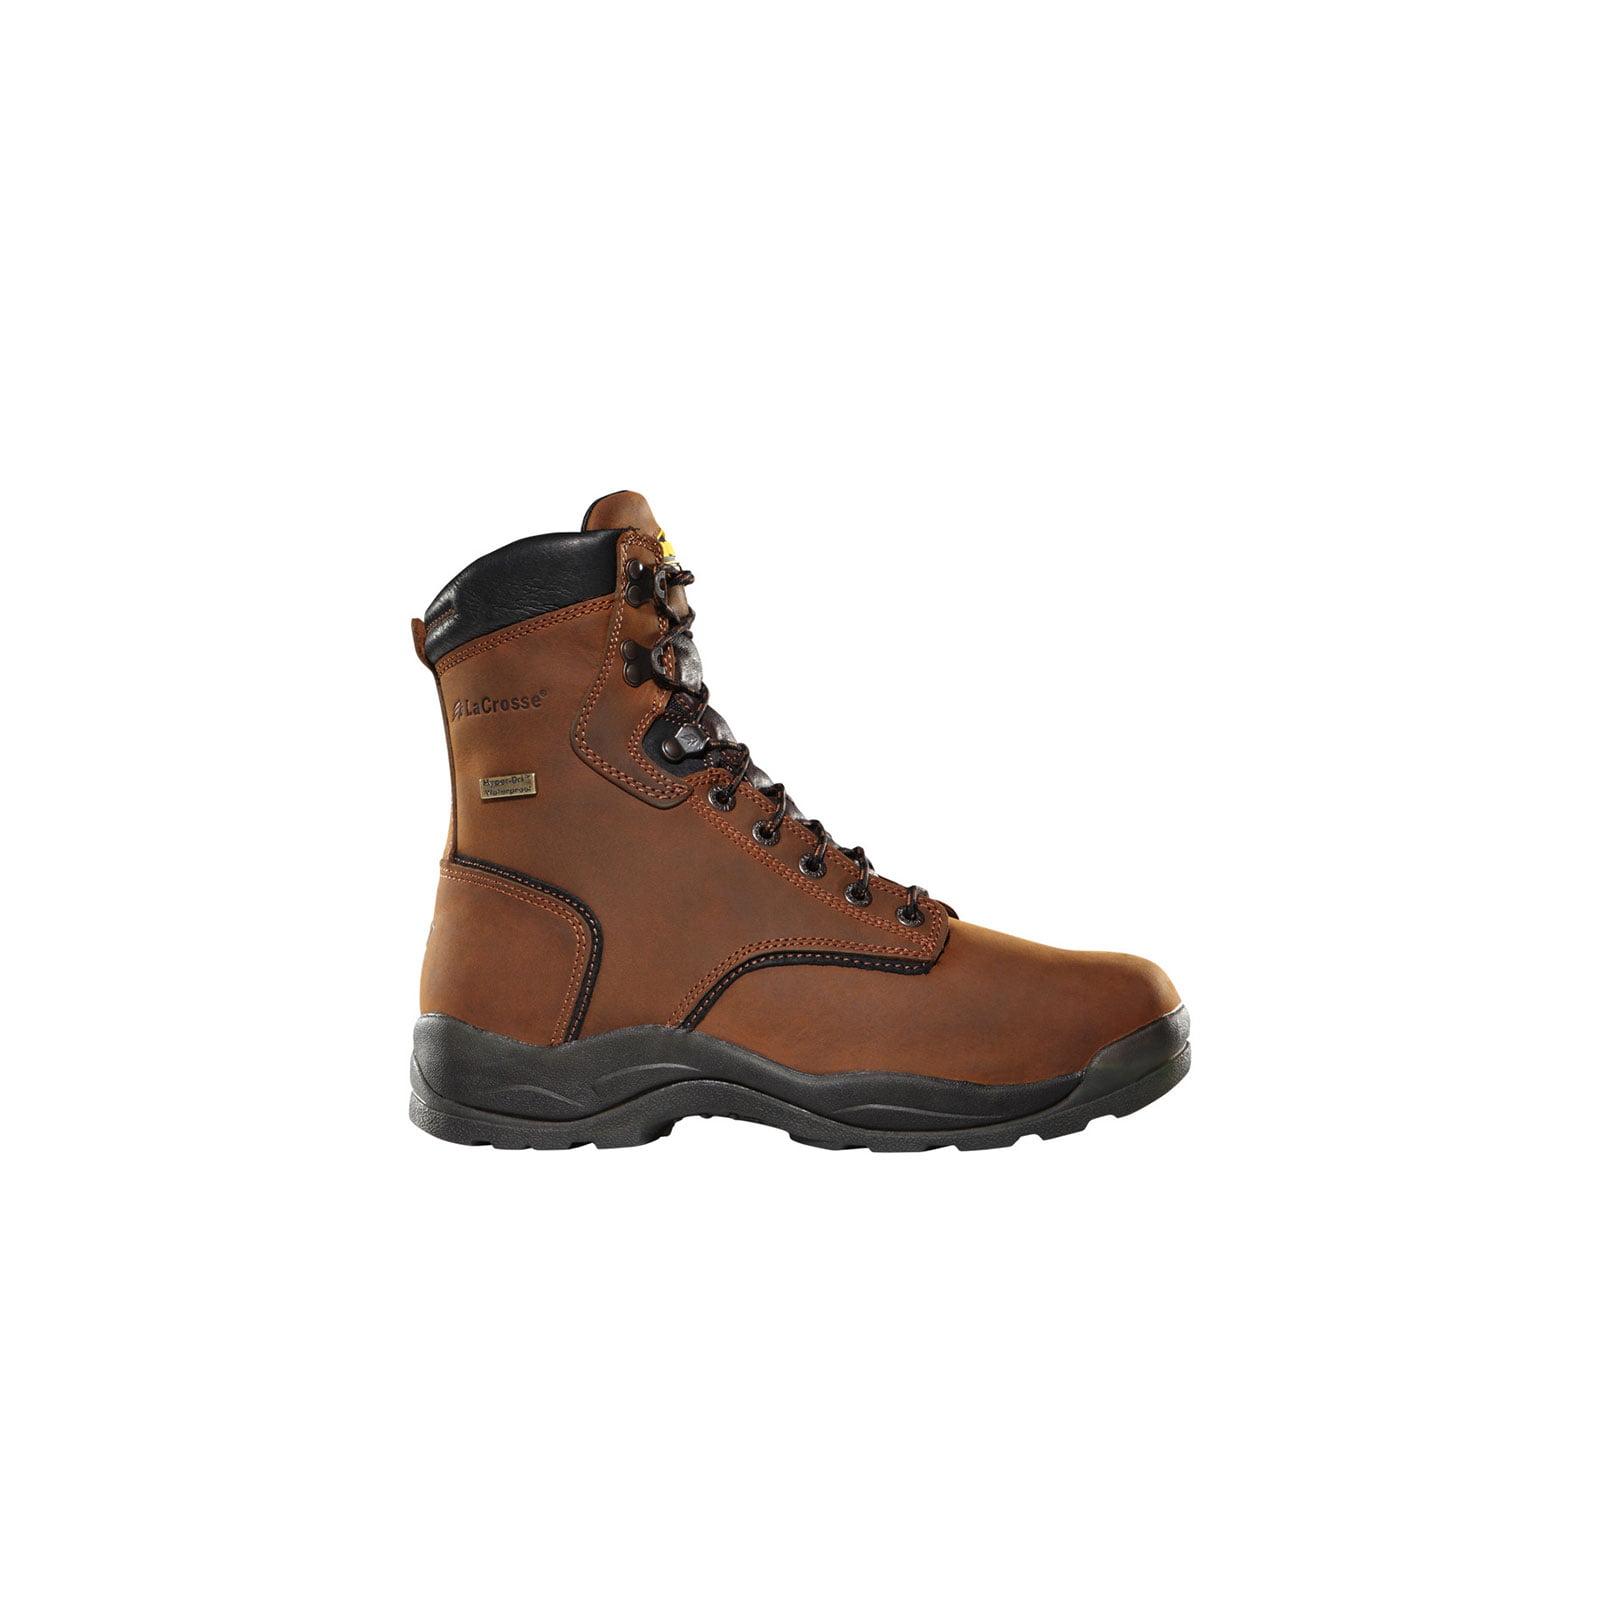 LaCrosse Mens Quad Comfort 4 x 8 Dry Core Steel Toe Brown...